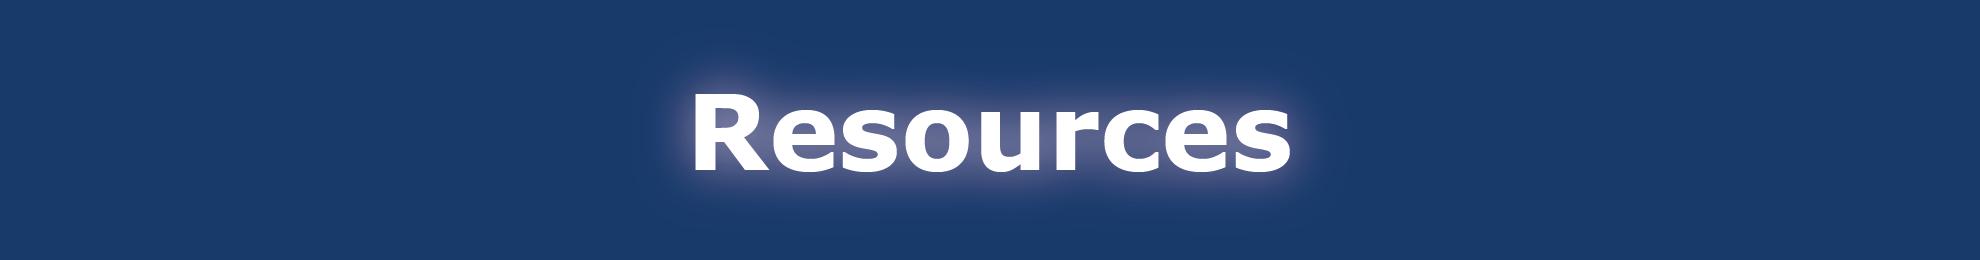 Resources Page Header Banner